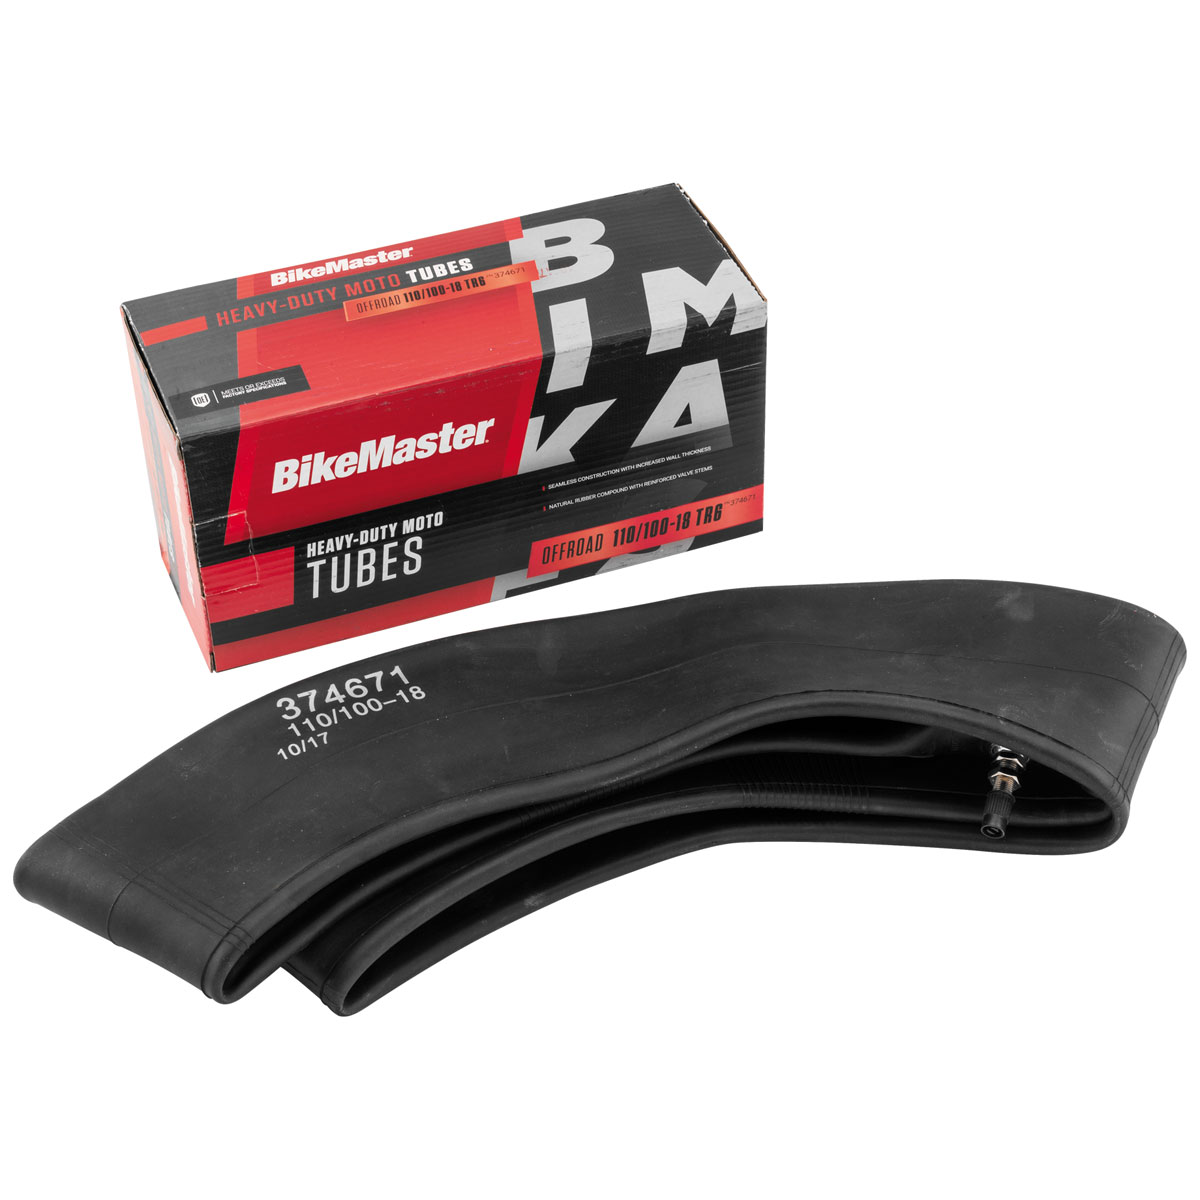 BikeMaster 110/100-18 Heavy Duty TR-6 Straight Metal Stem Tube